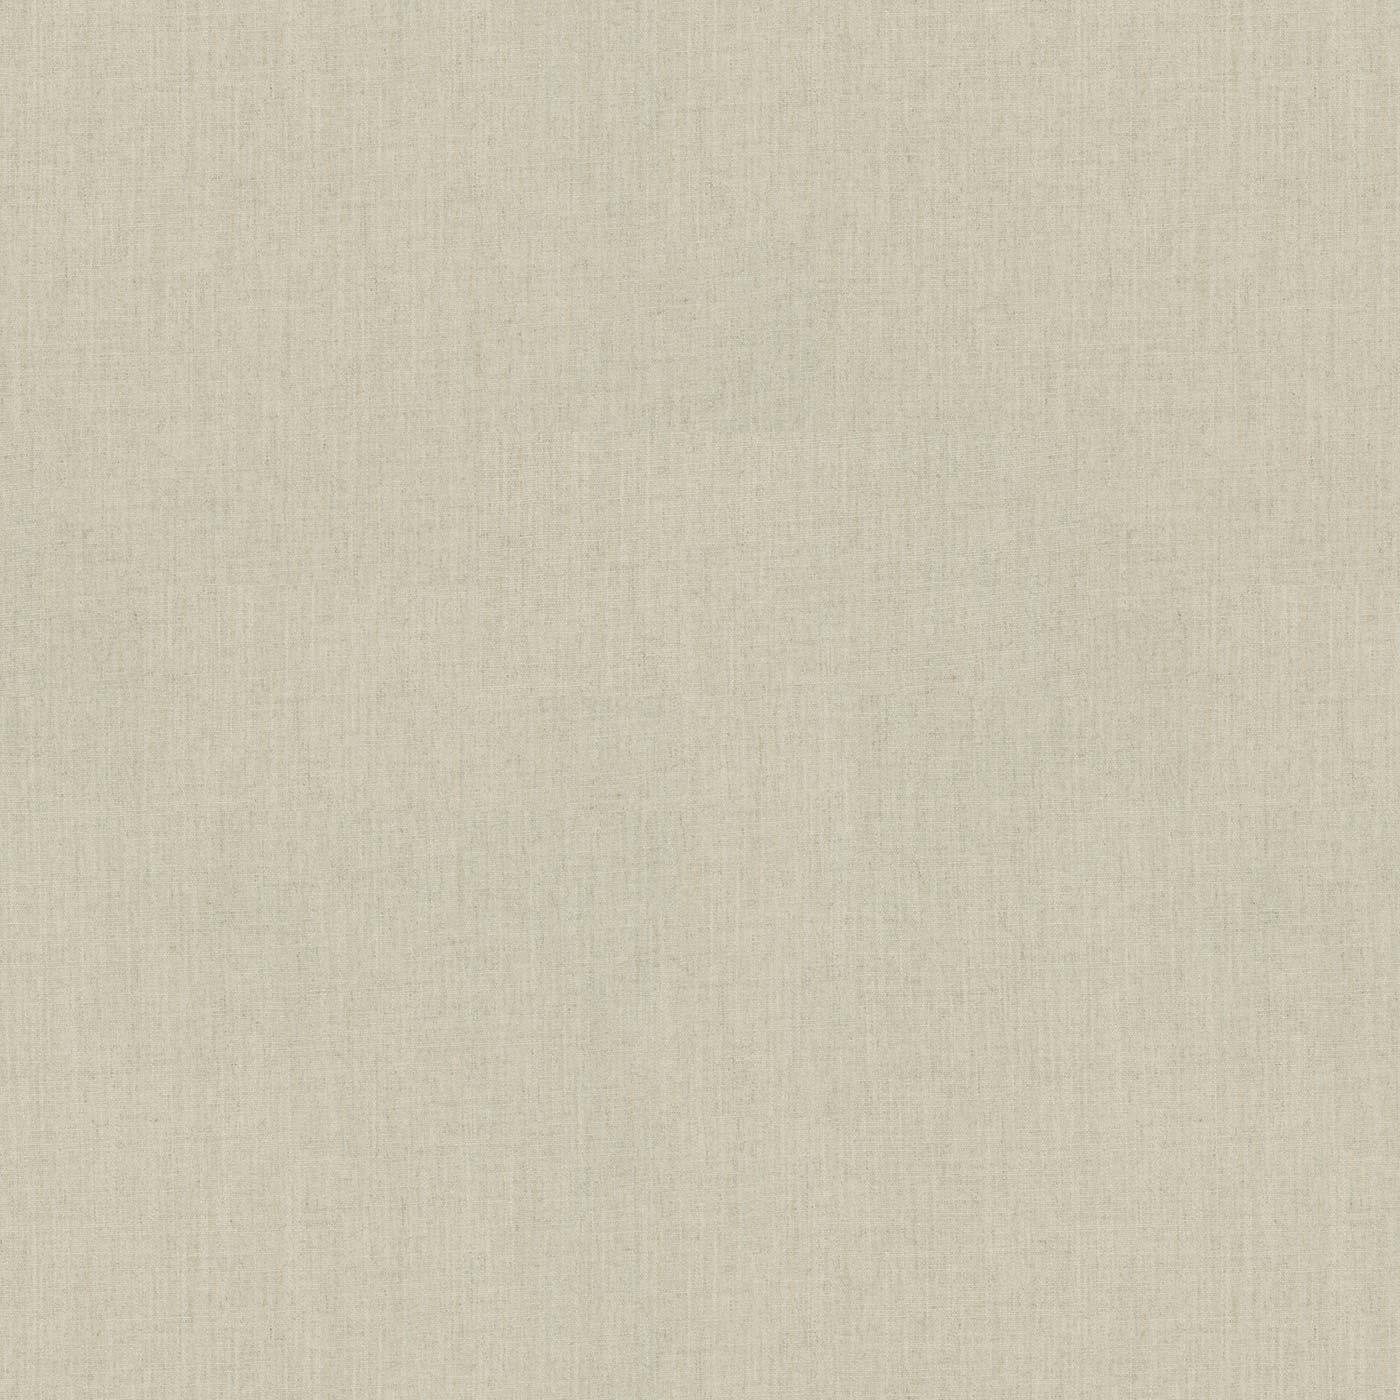 Aragon Linen